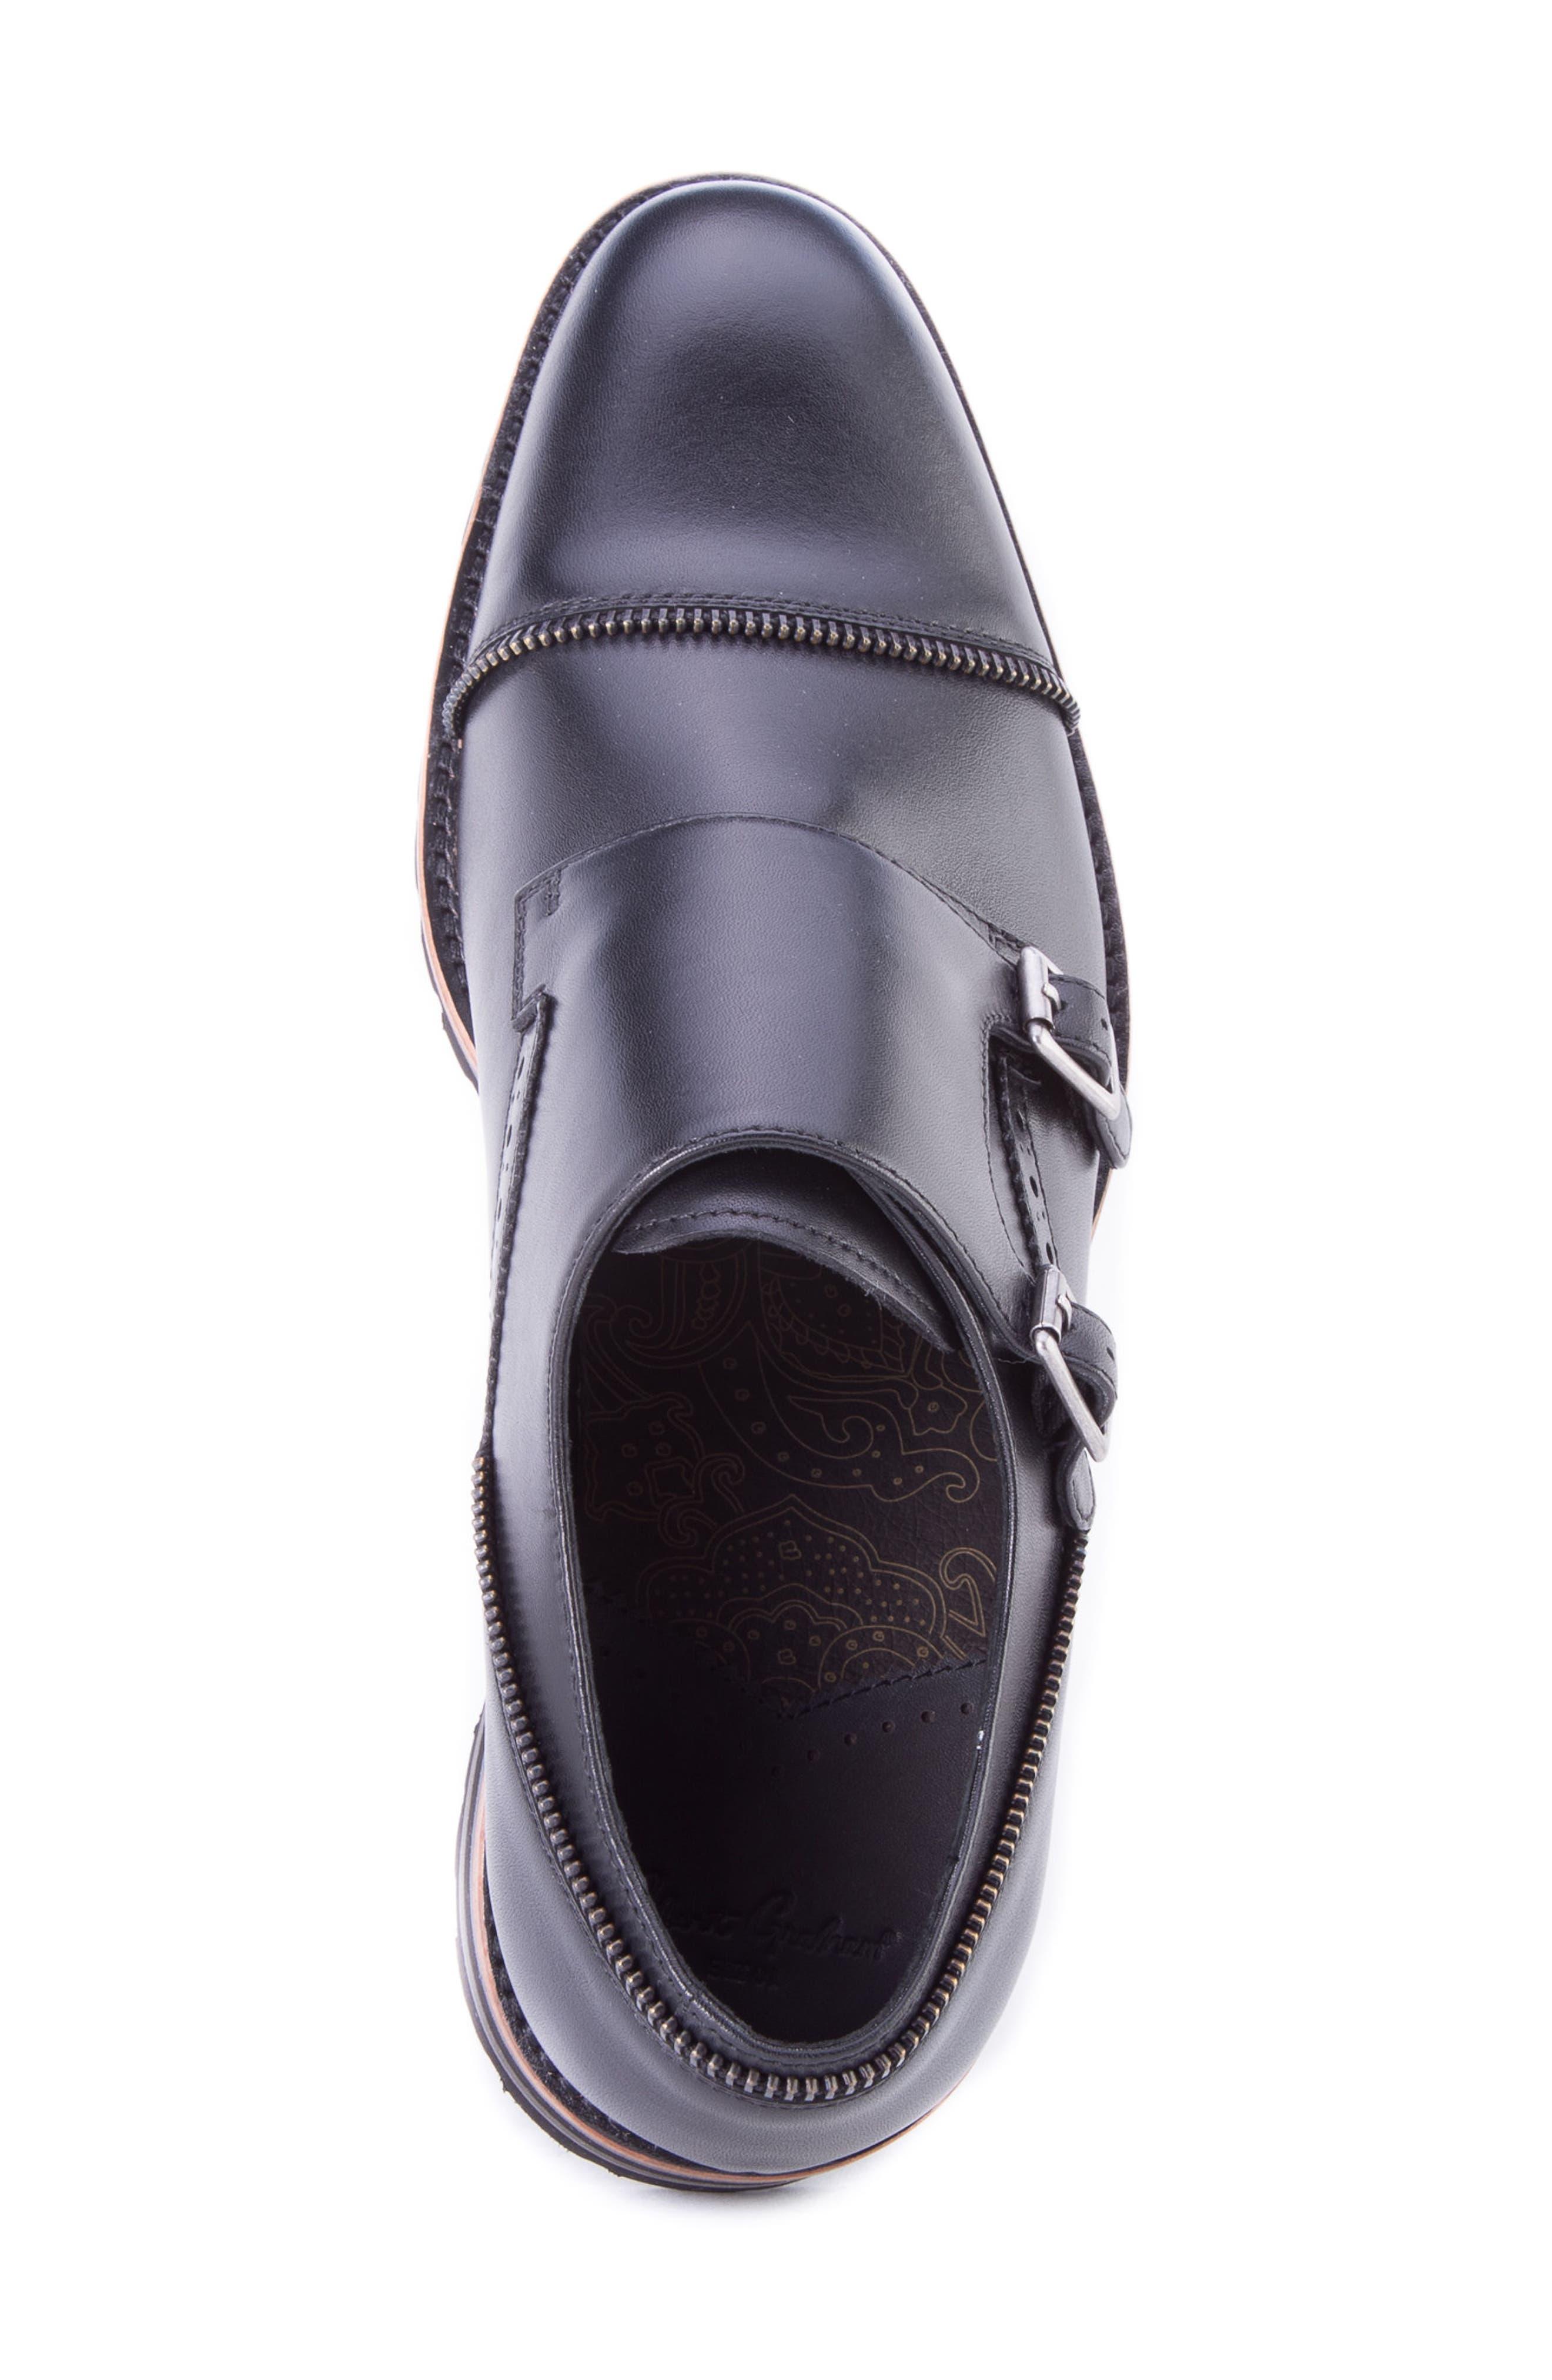 Acadia Double Buckle Monk Shoe,                             Alternate thumbnail 5, color,                             BLACK LEATHER